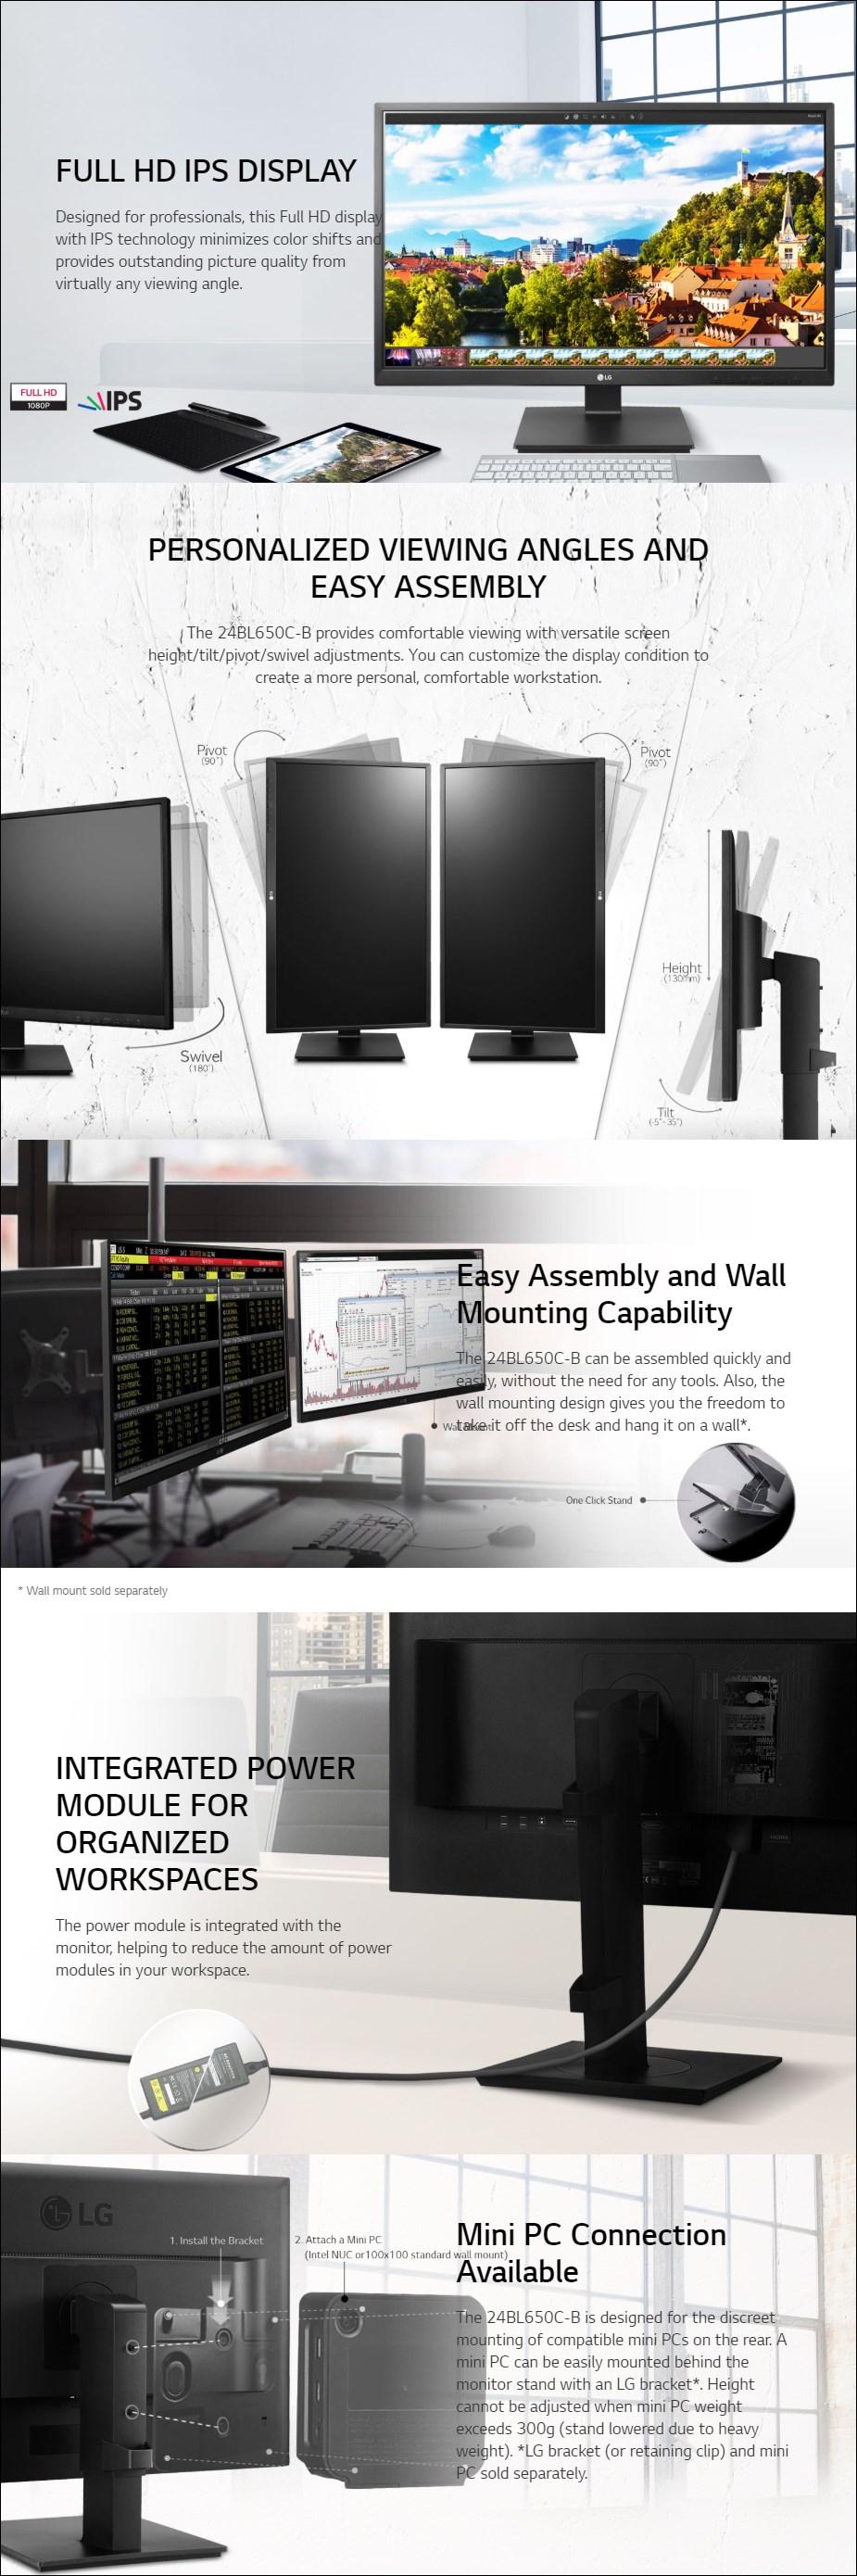 "LG 24BL650C-B 23.8"" Full HD Ergonomic IPS Business Monitor - Overview 1"